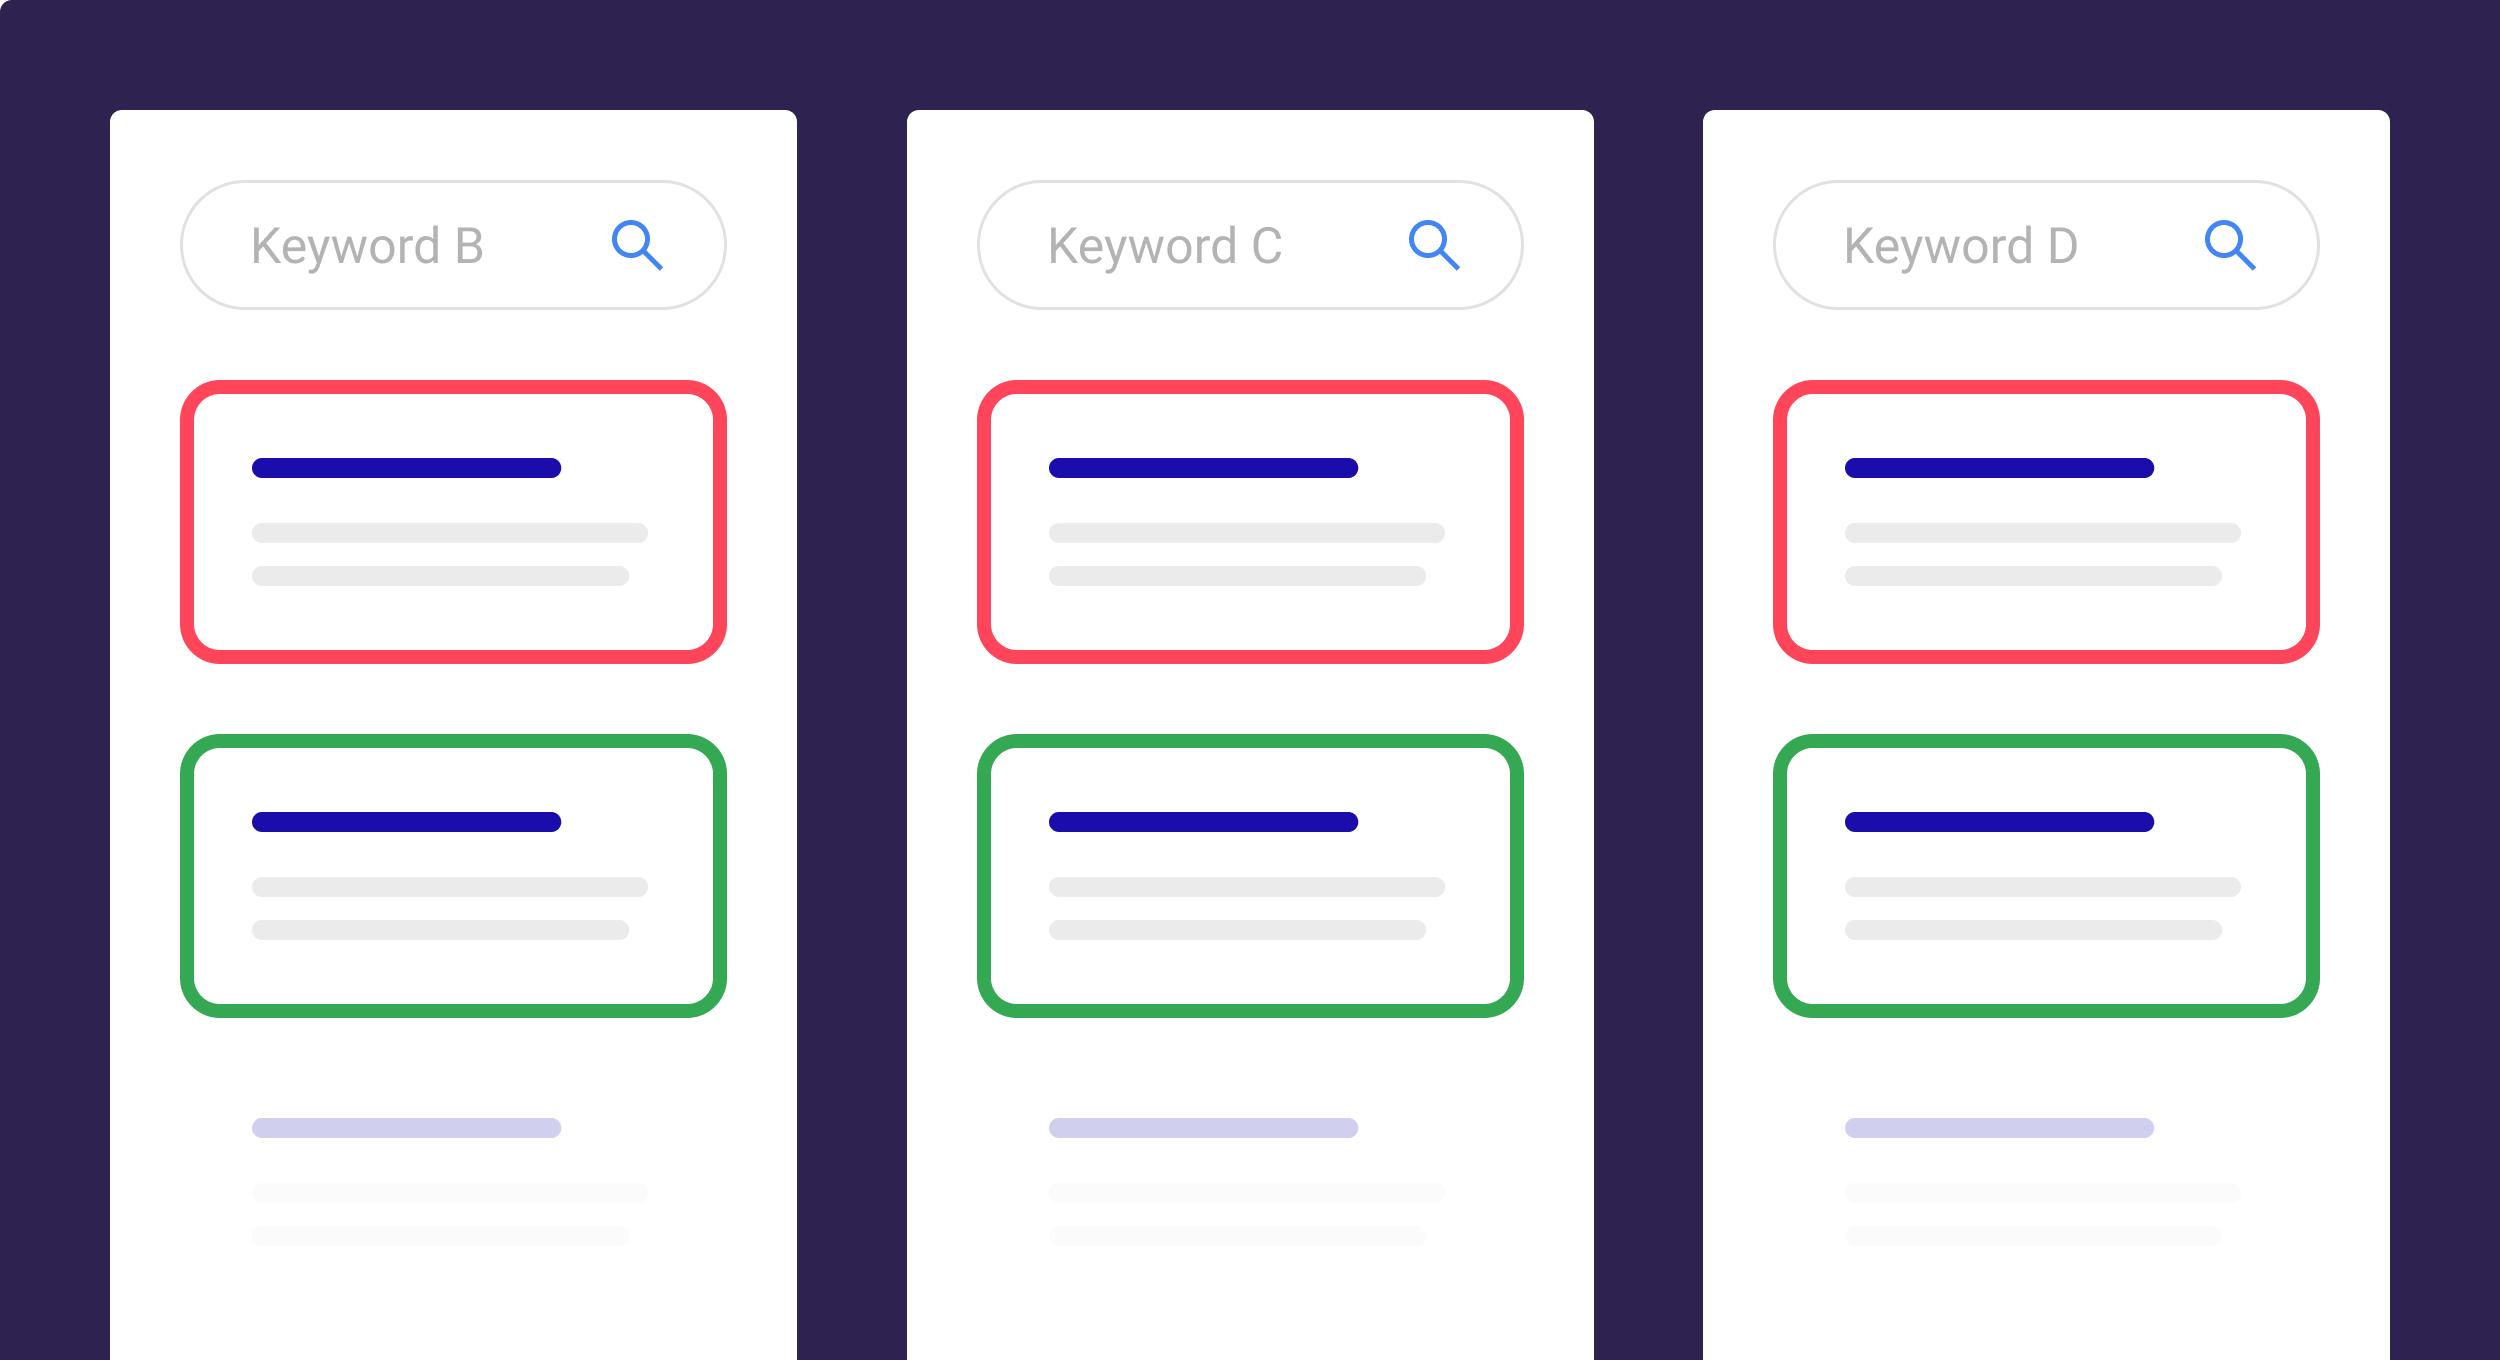 Keyword B, Keyword C and Keyword D